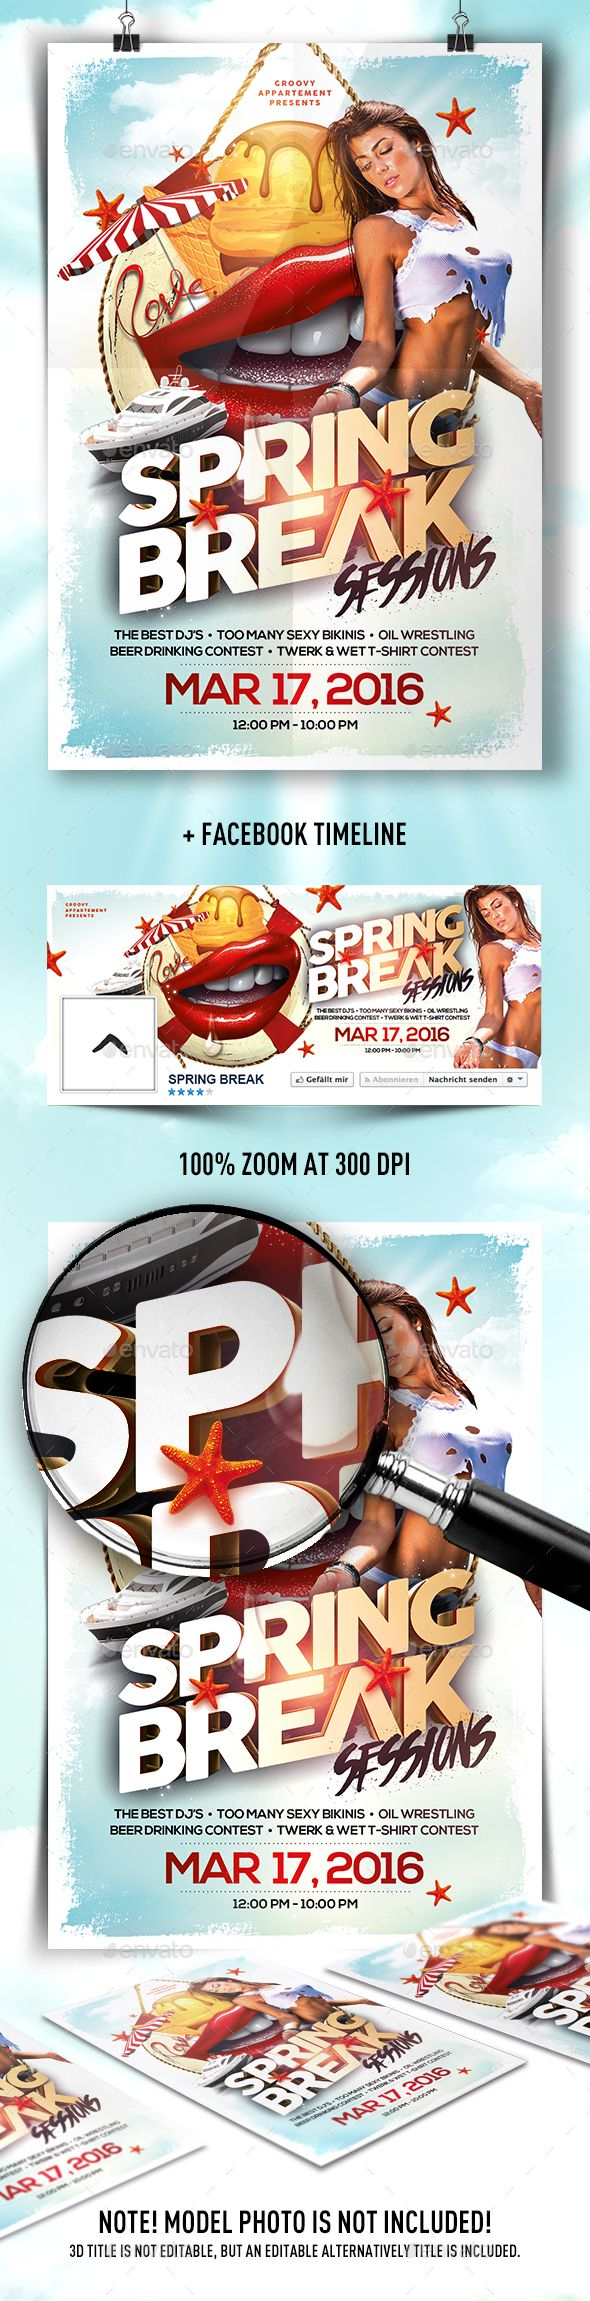 Poster design template psd - Spring Break Sessions Flyer Psd Templatesflyer